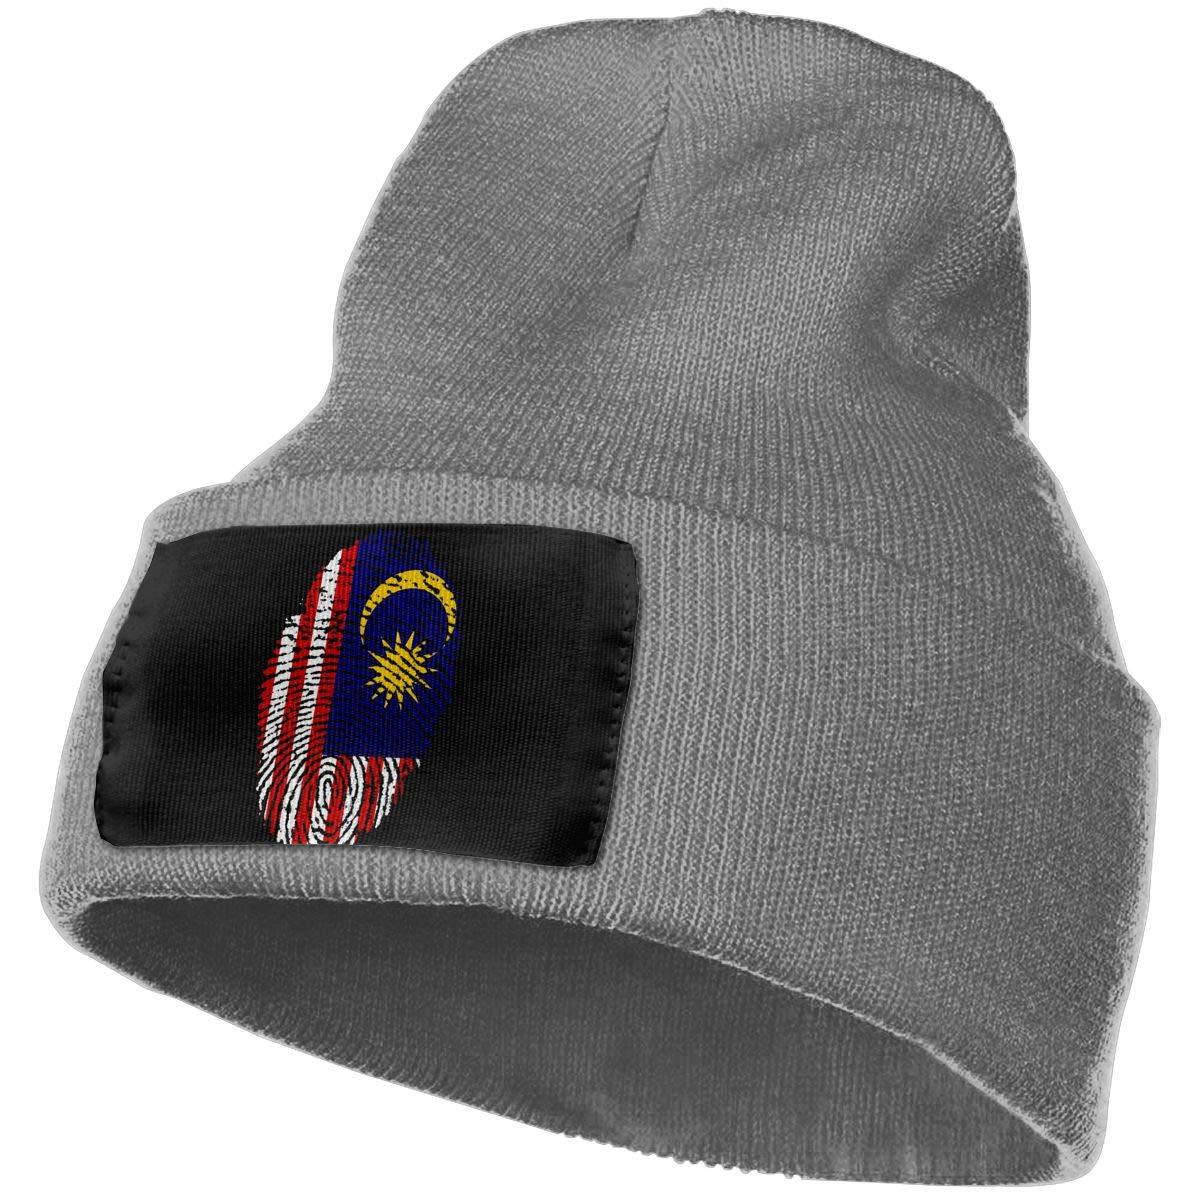 Rainbow Pride LGBT Warm Winter Hat Knit Beanie Skull Cap Cuff Beanie Hat Winter Hats for Men /& Women